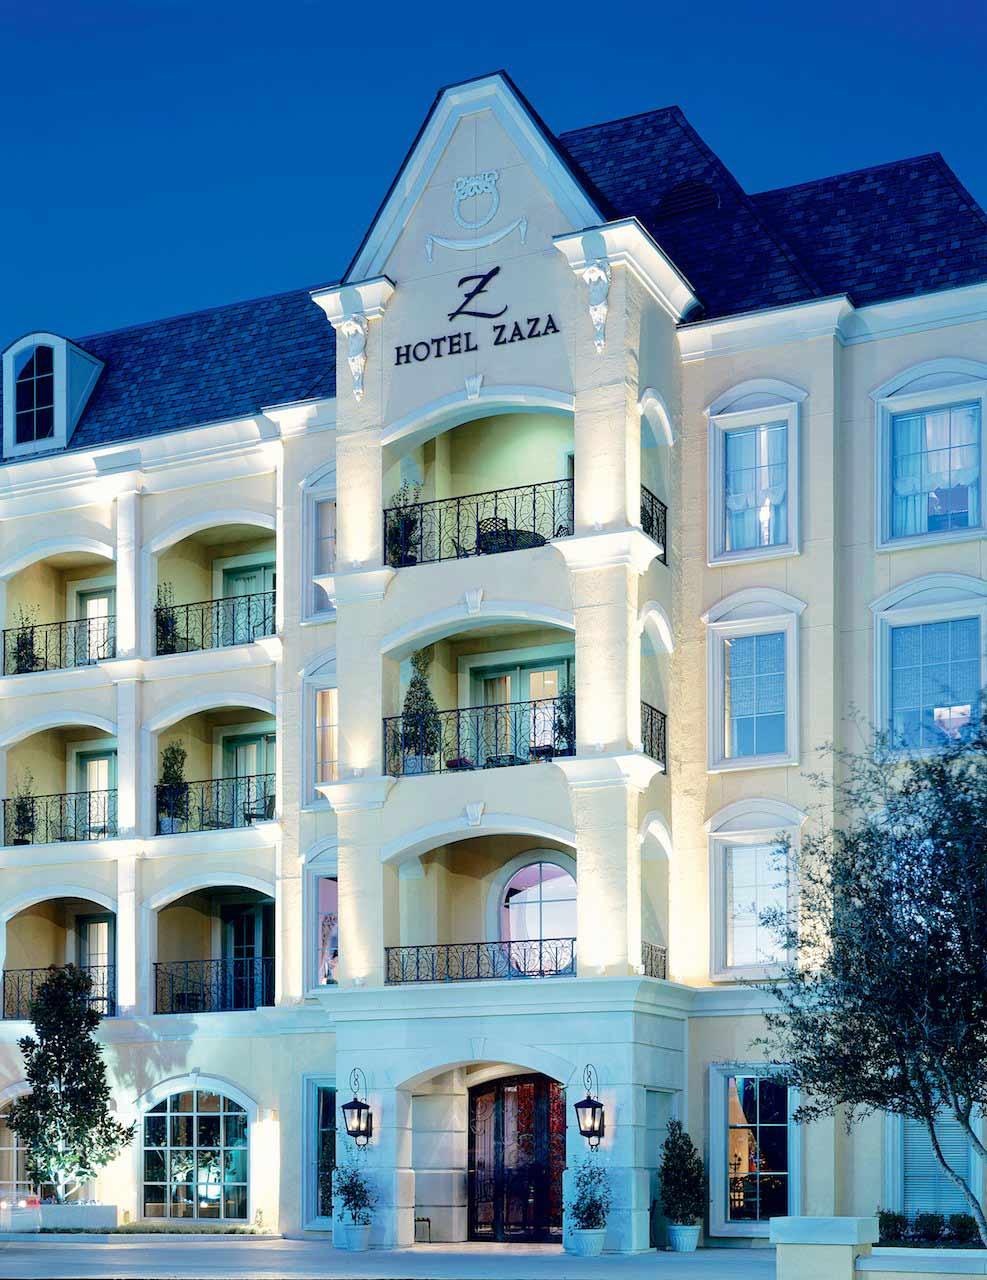 Exterior of Hotel Zaza DallasTexas